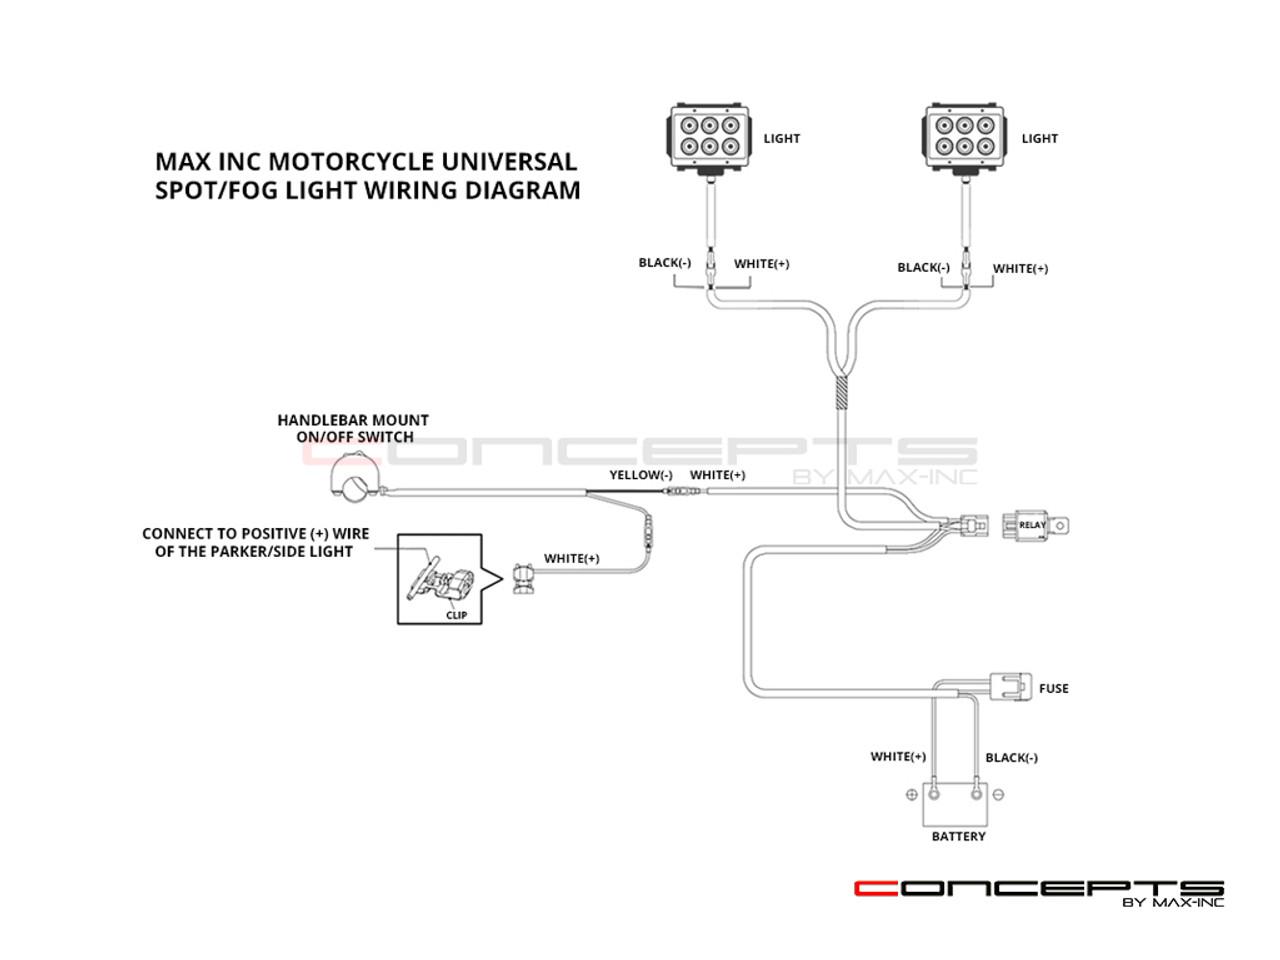 Complete DIY Universal Motorcycle Spot / Fog Light Wiring Kit - PLUG N PLAY  - www.max-inc.cn | Motorcycle Fog Lights Wiring Diagram |  | MAX-INC